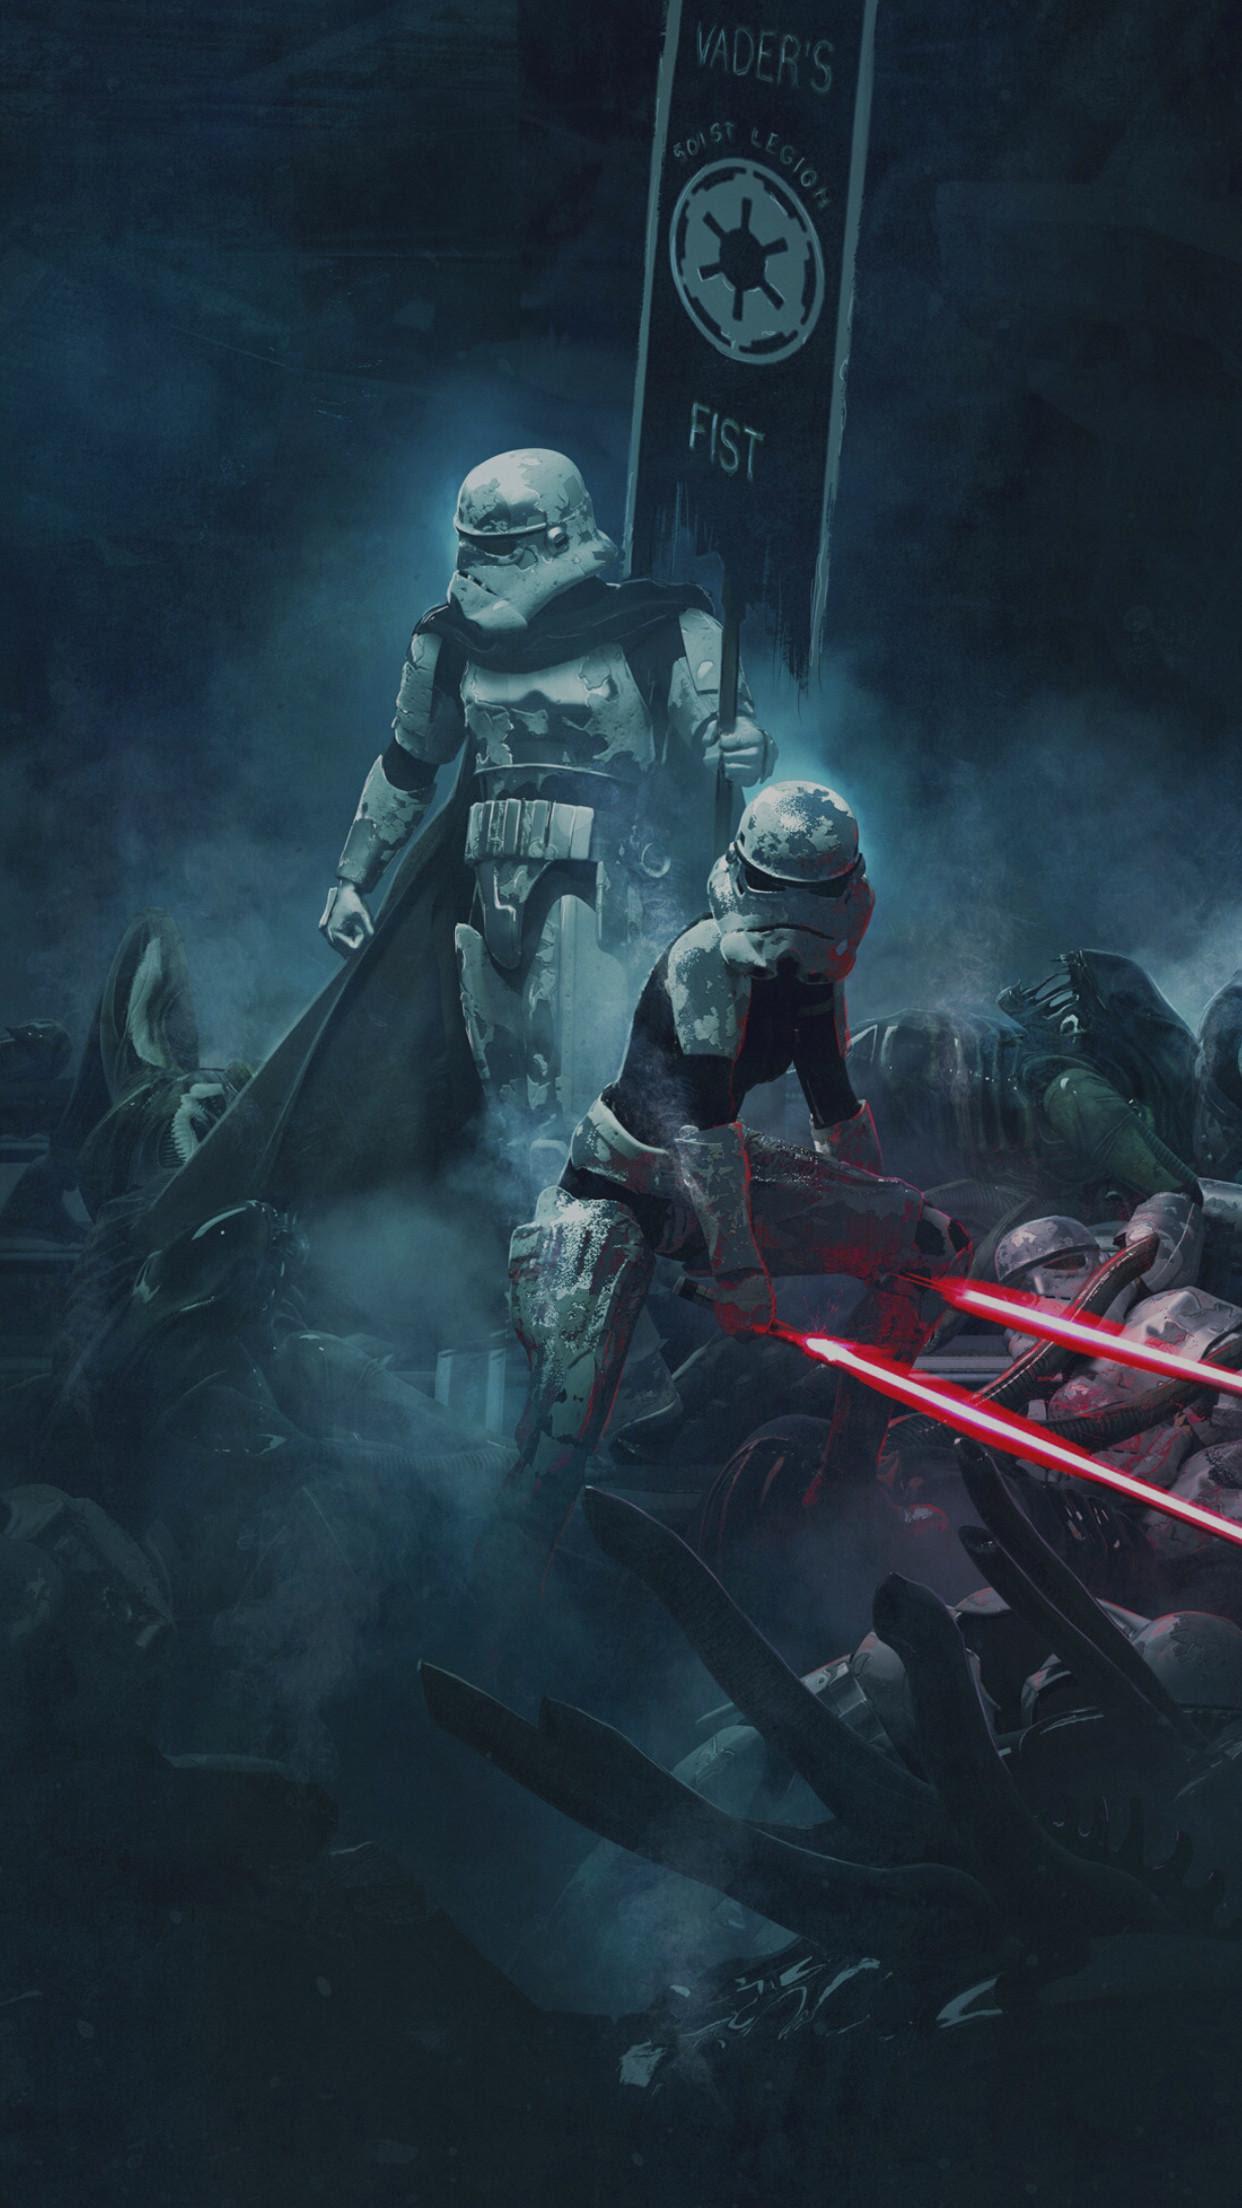 Top 35 Best Star Wars Iphone Wallpapers Iphone Wallpapers